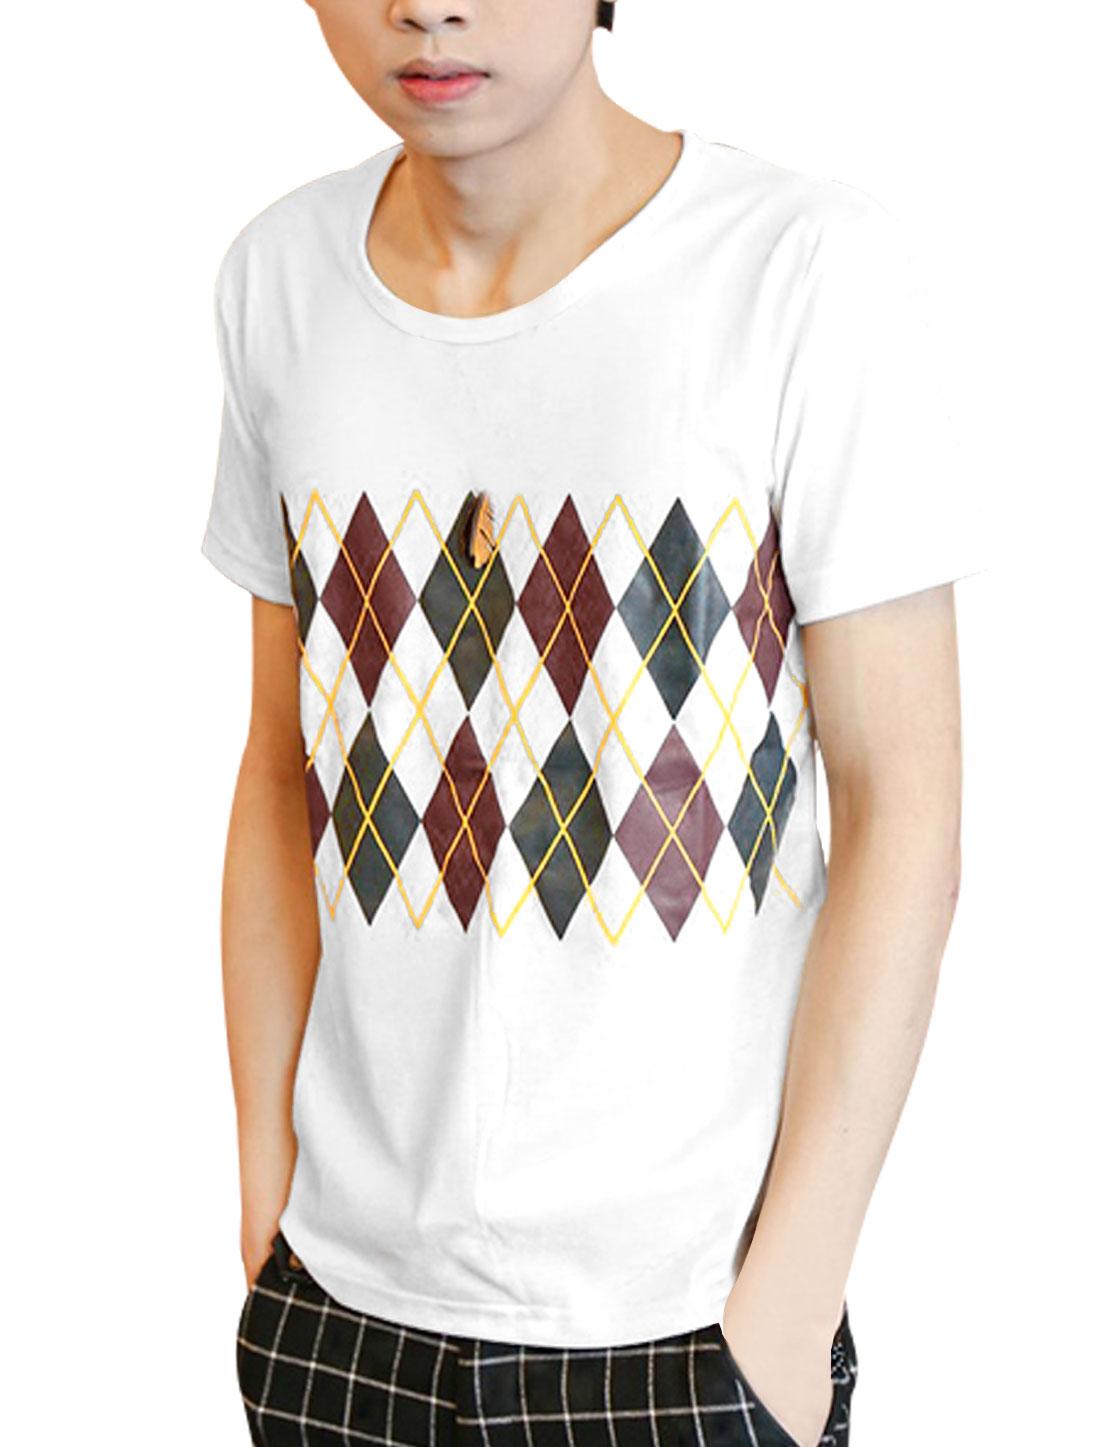 Men Short Sleeve Argyle Printed Trendy Tee Shirt White S